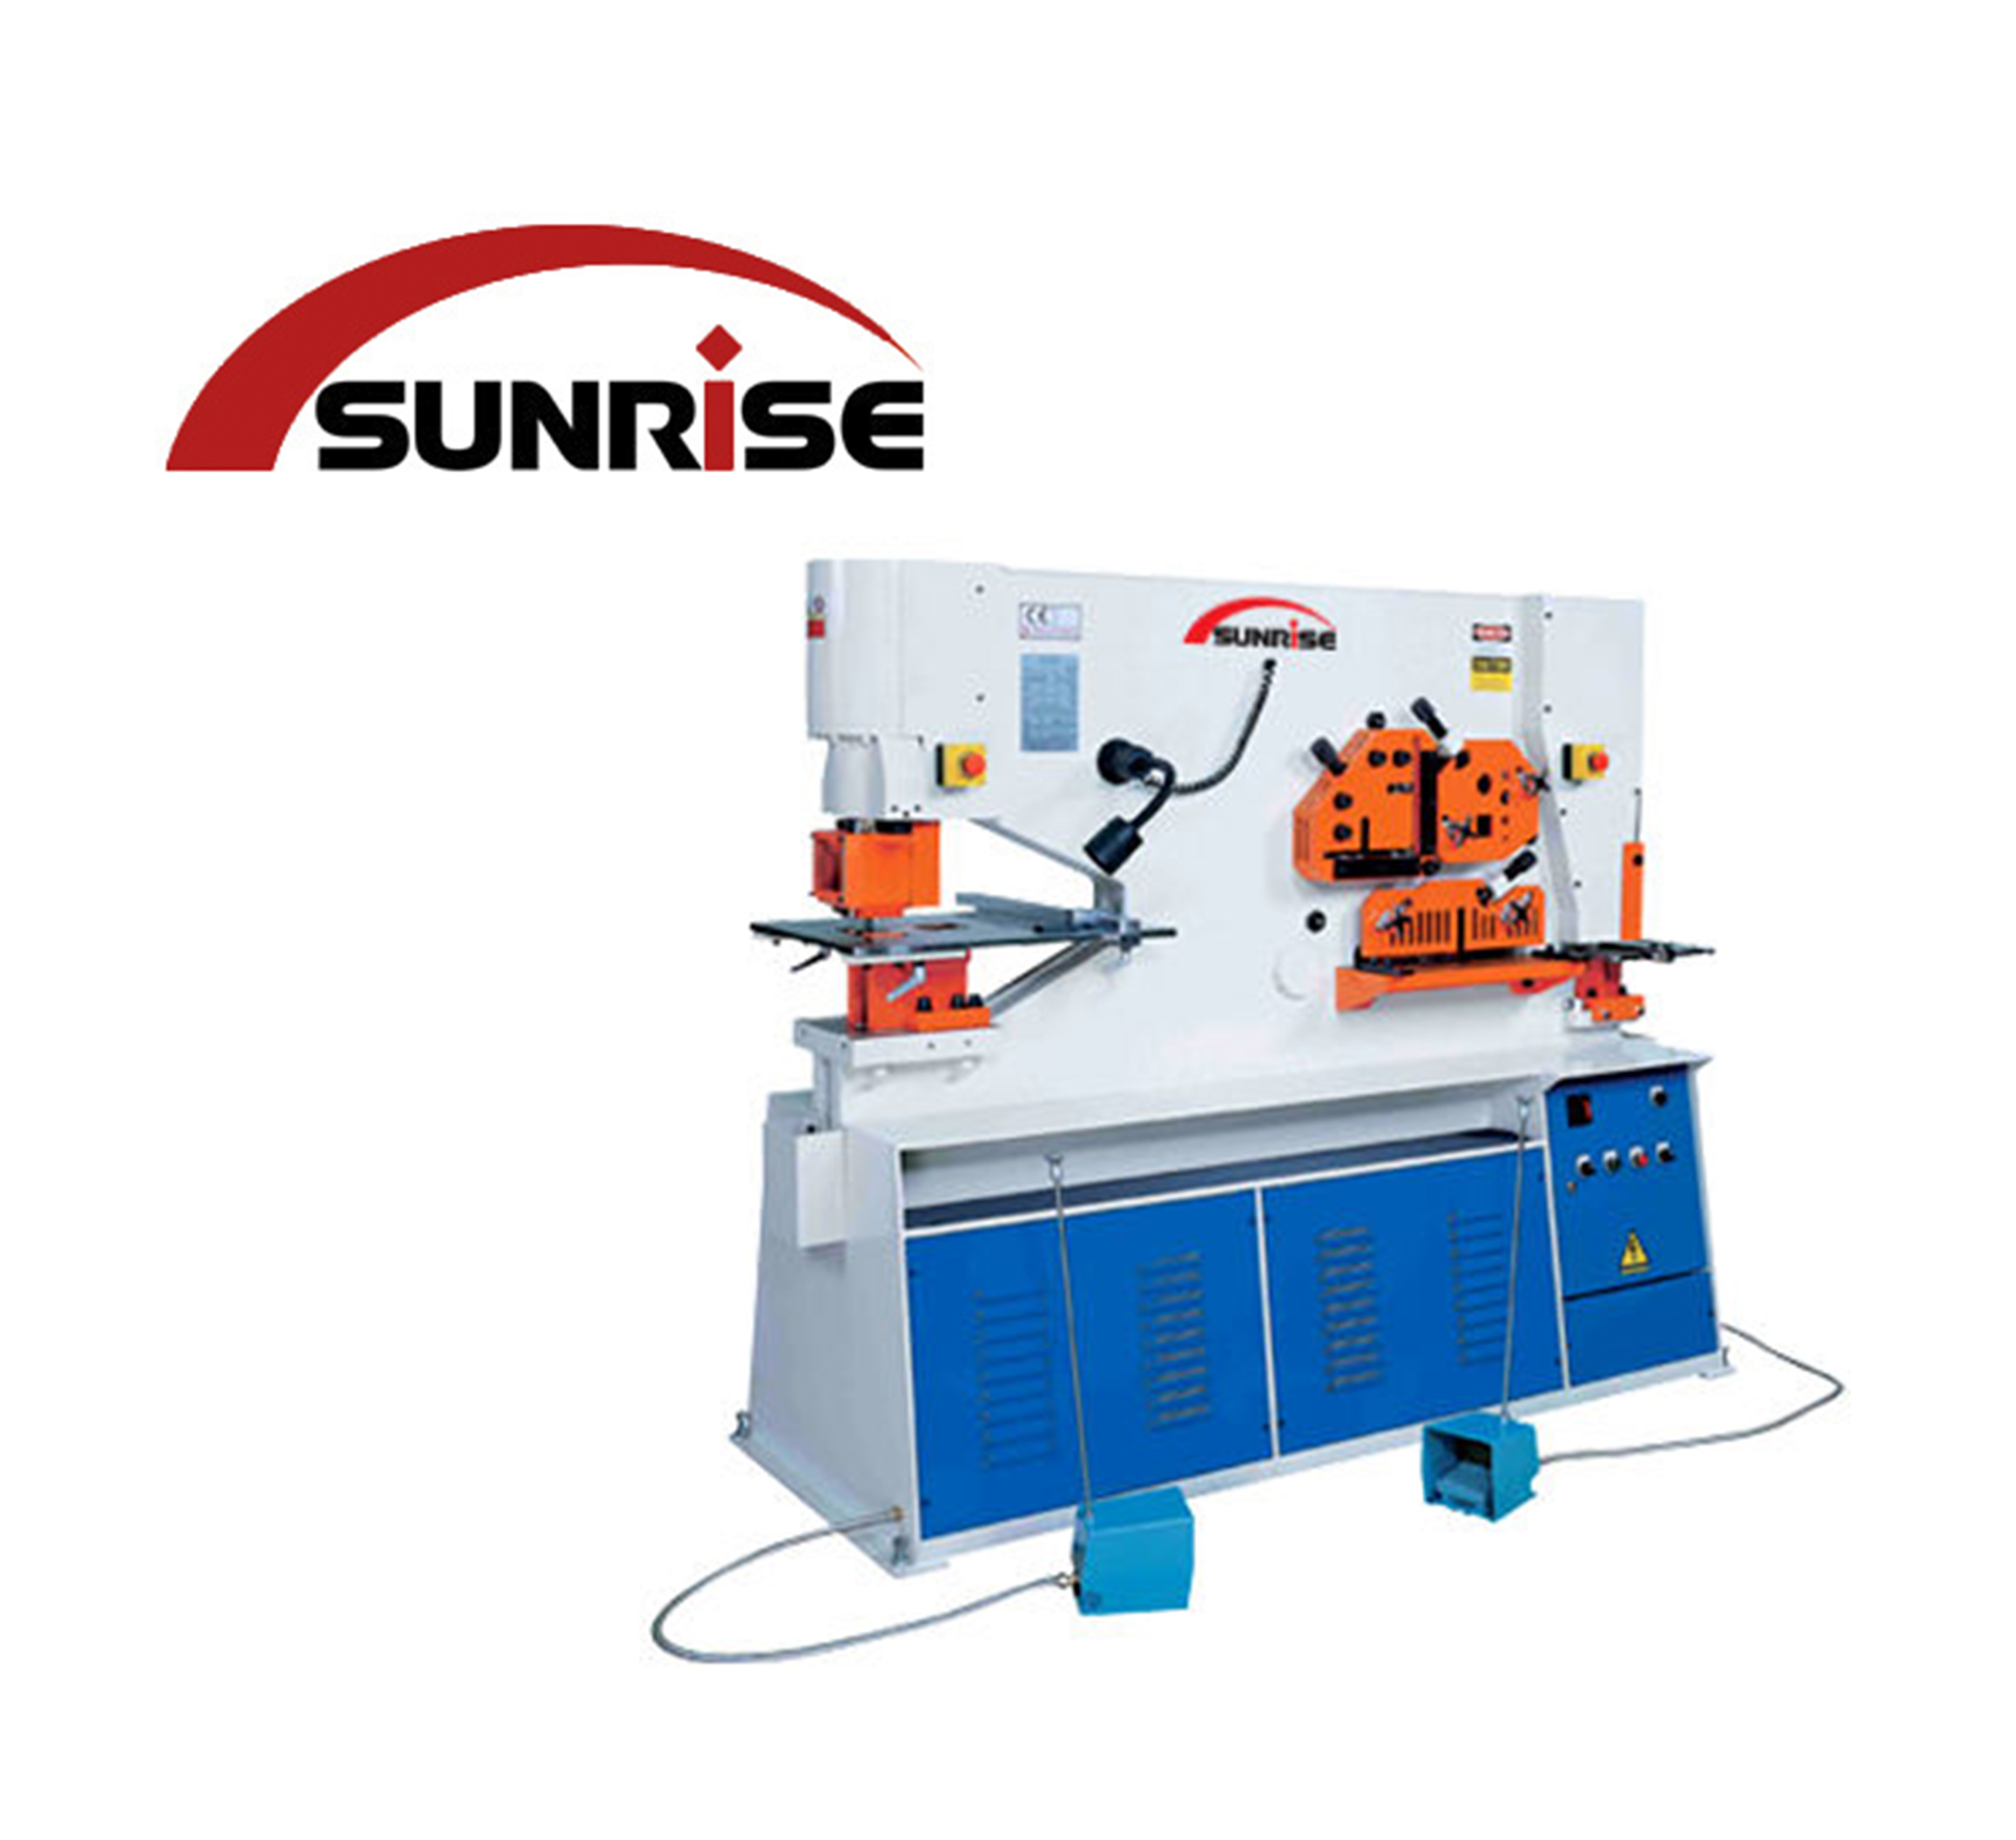 Punching Technology | Lister Machine Tools Ireland